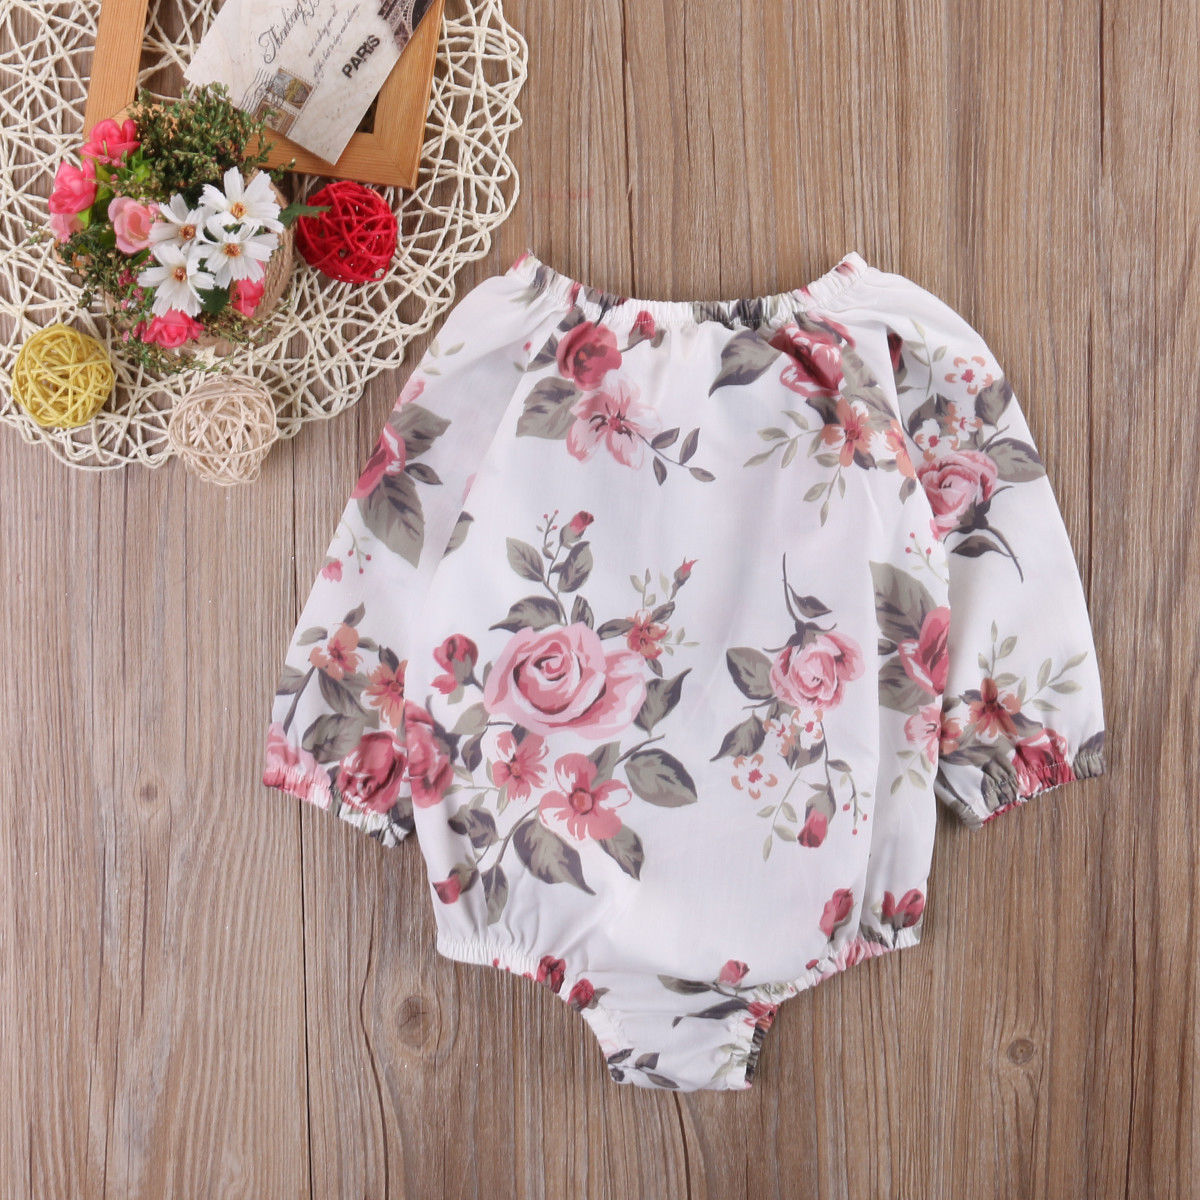 Toddler Flower T-Shirt Floral Baby-Girl Bodysuit Infant Newborn 0-24M Outfit-Set